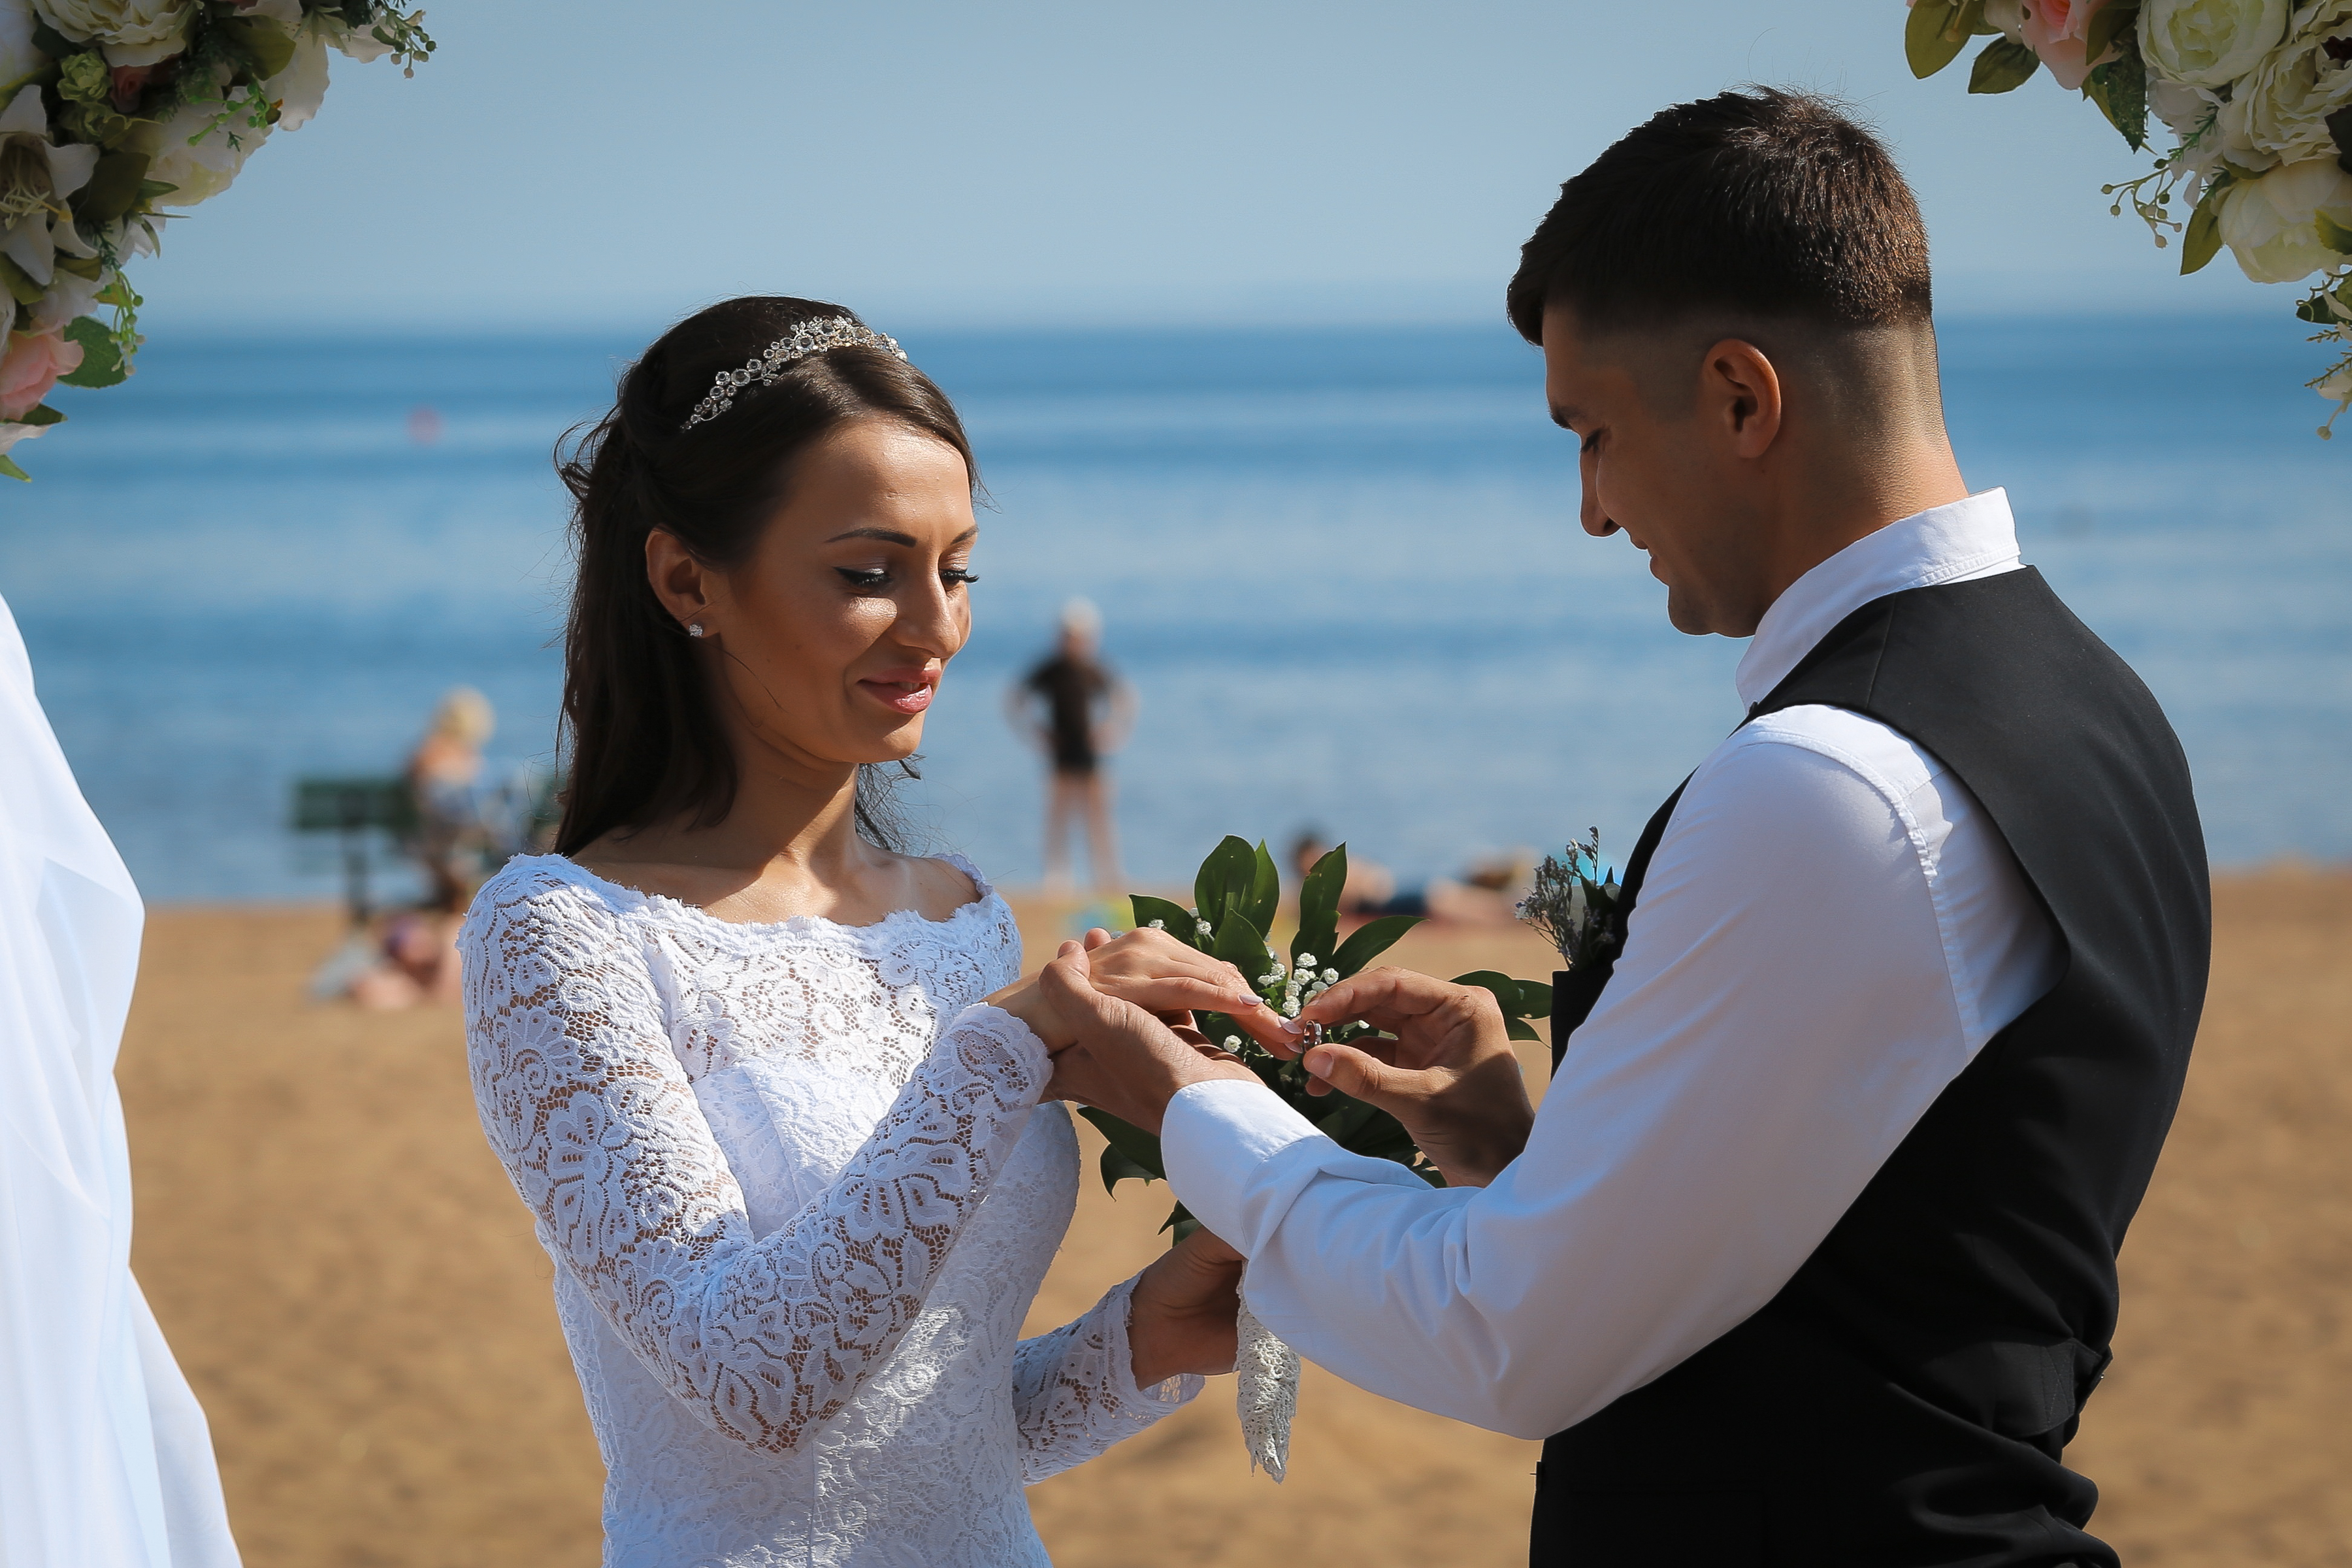 https://sleeklens.com/wp-content/uploads/2018/09/wedding-lightroom-presets-signature-bride-groom-after-9.jpg